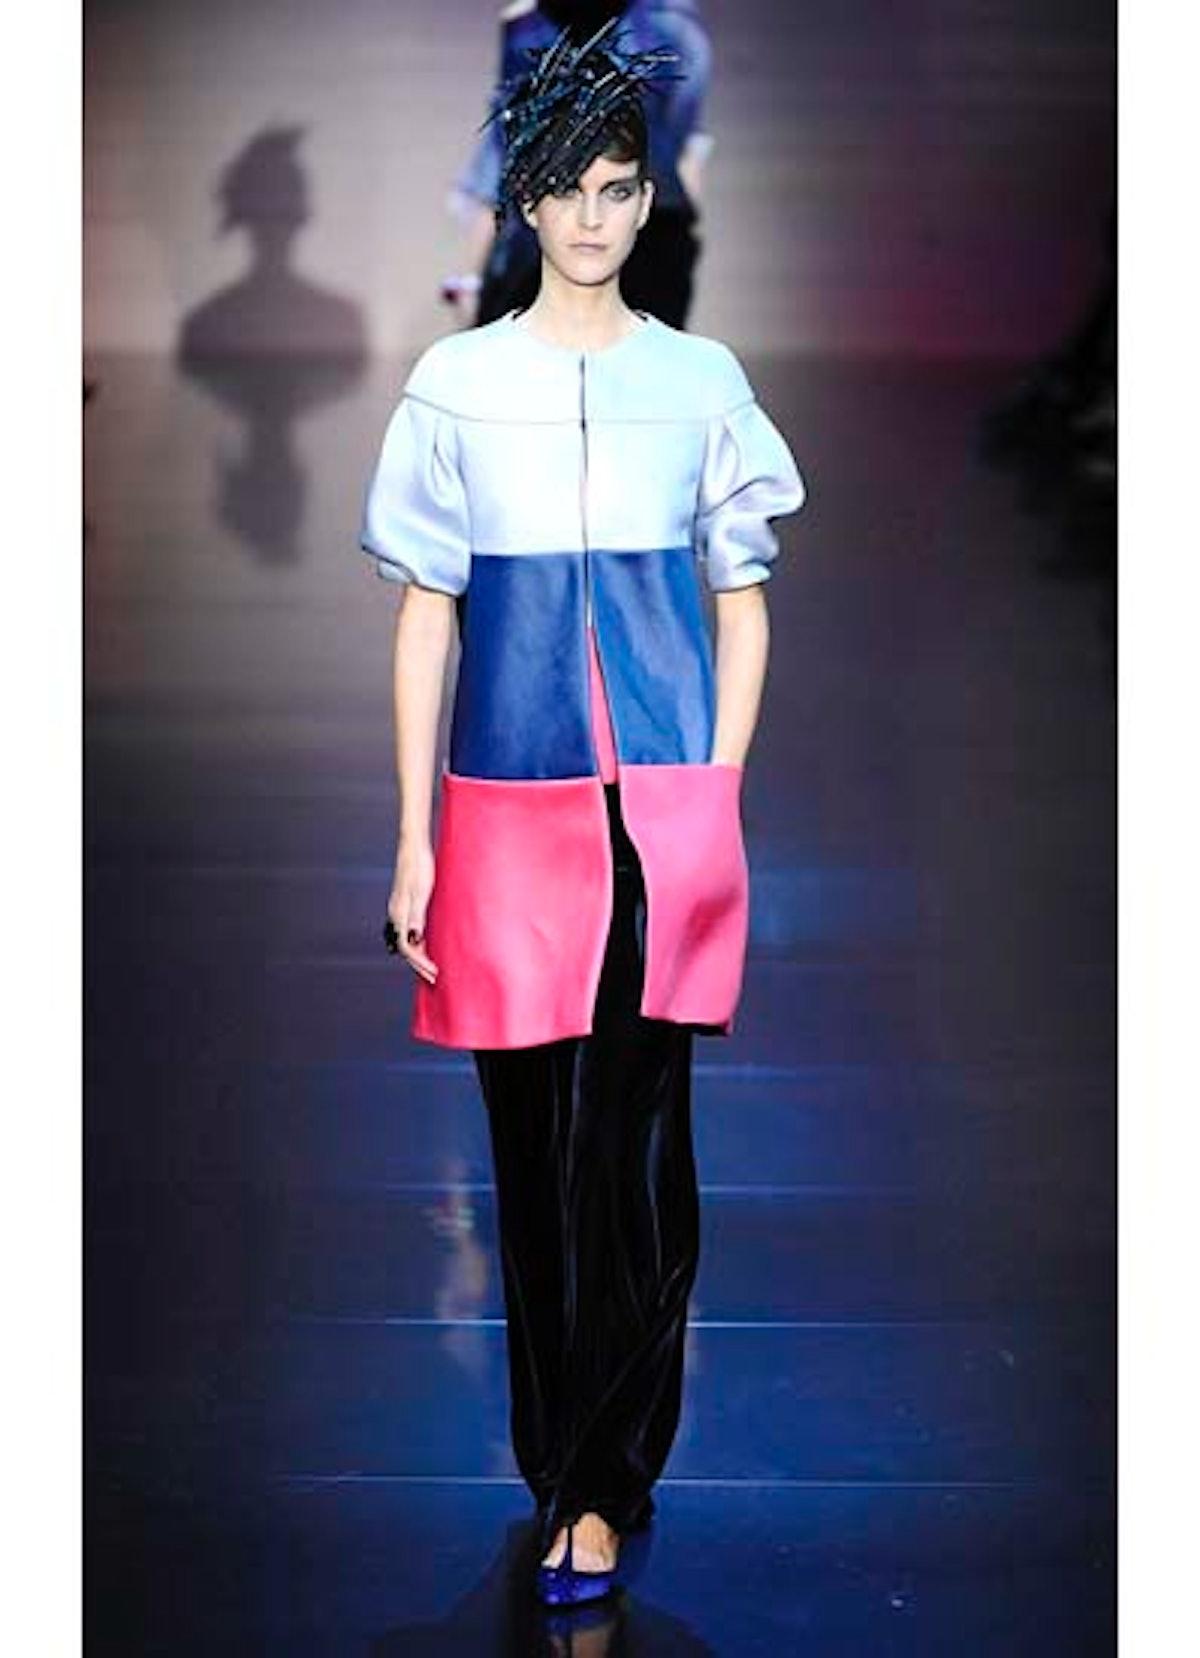 fass-giorgio-armani-couture-2012-runway-26-v.jpg